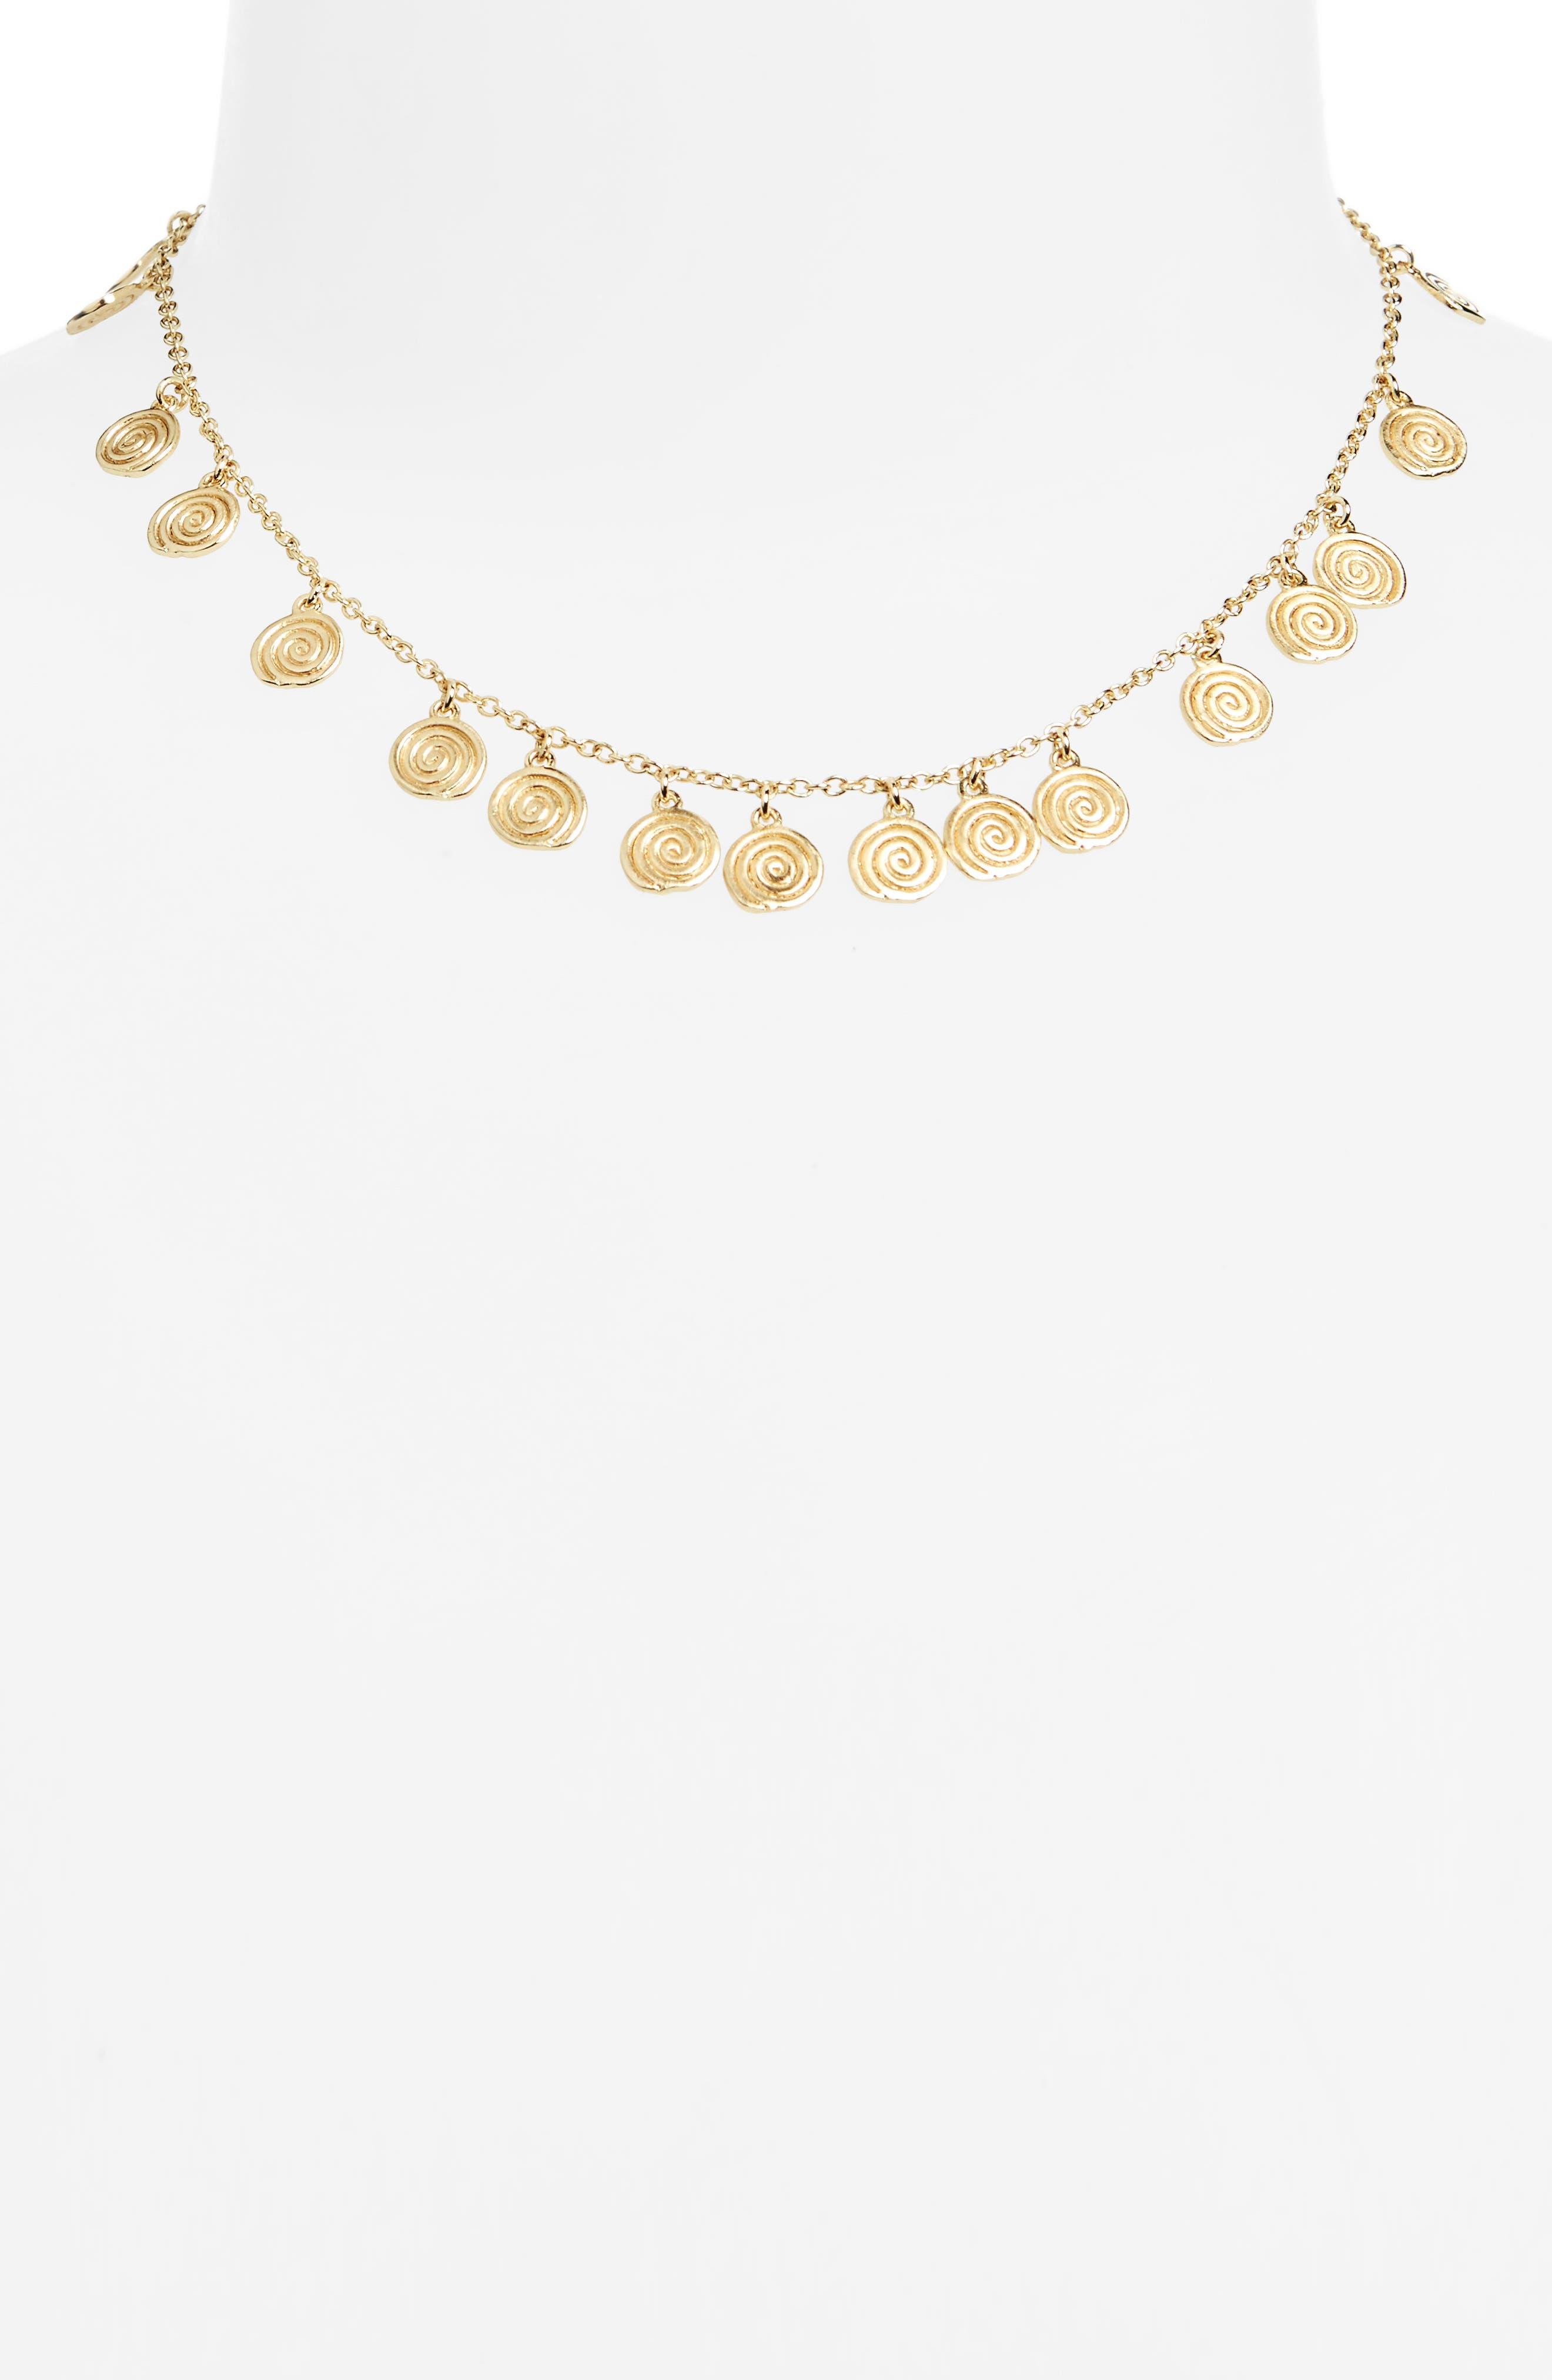 Main Image - Elizabeth and James Sullivan - Reeves Charm Necklace